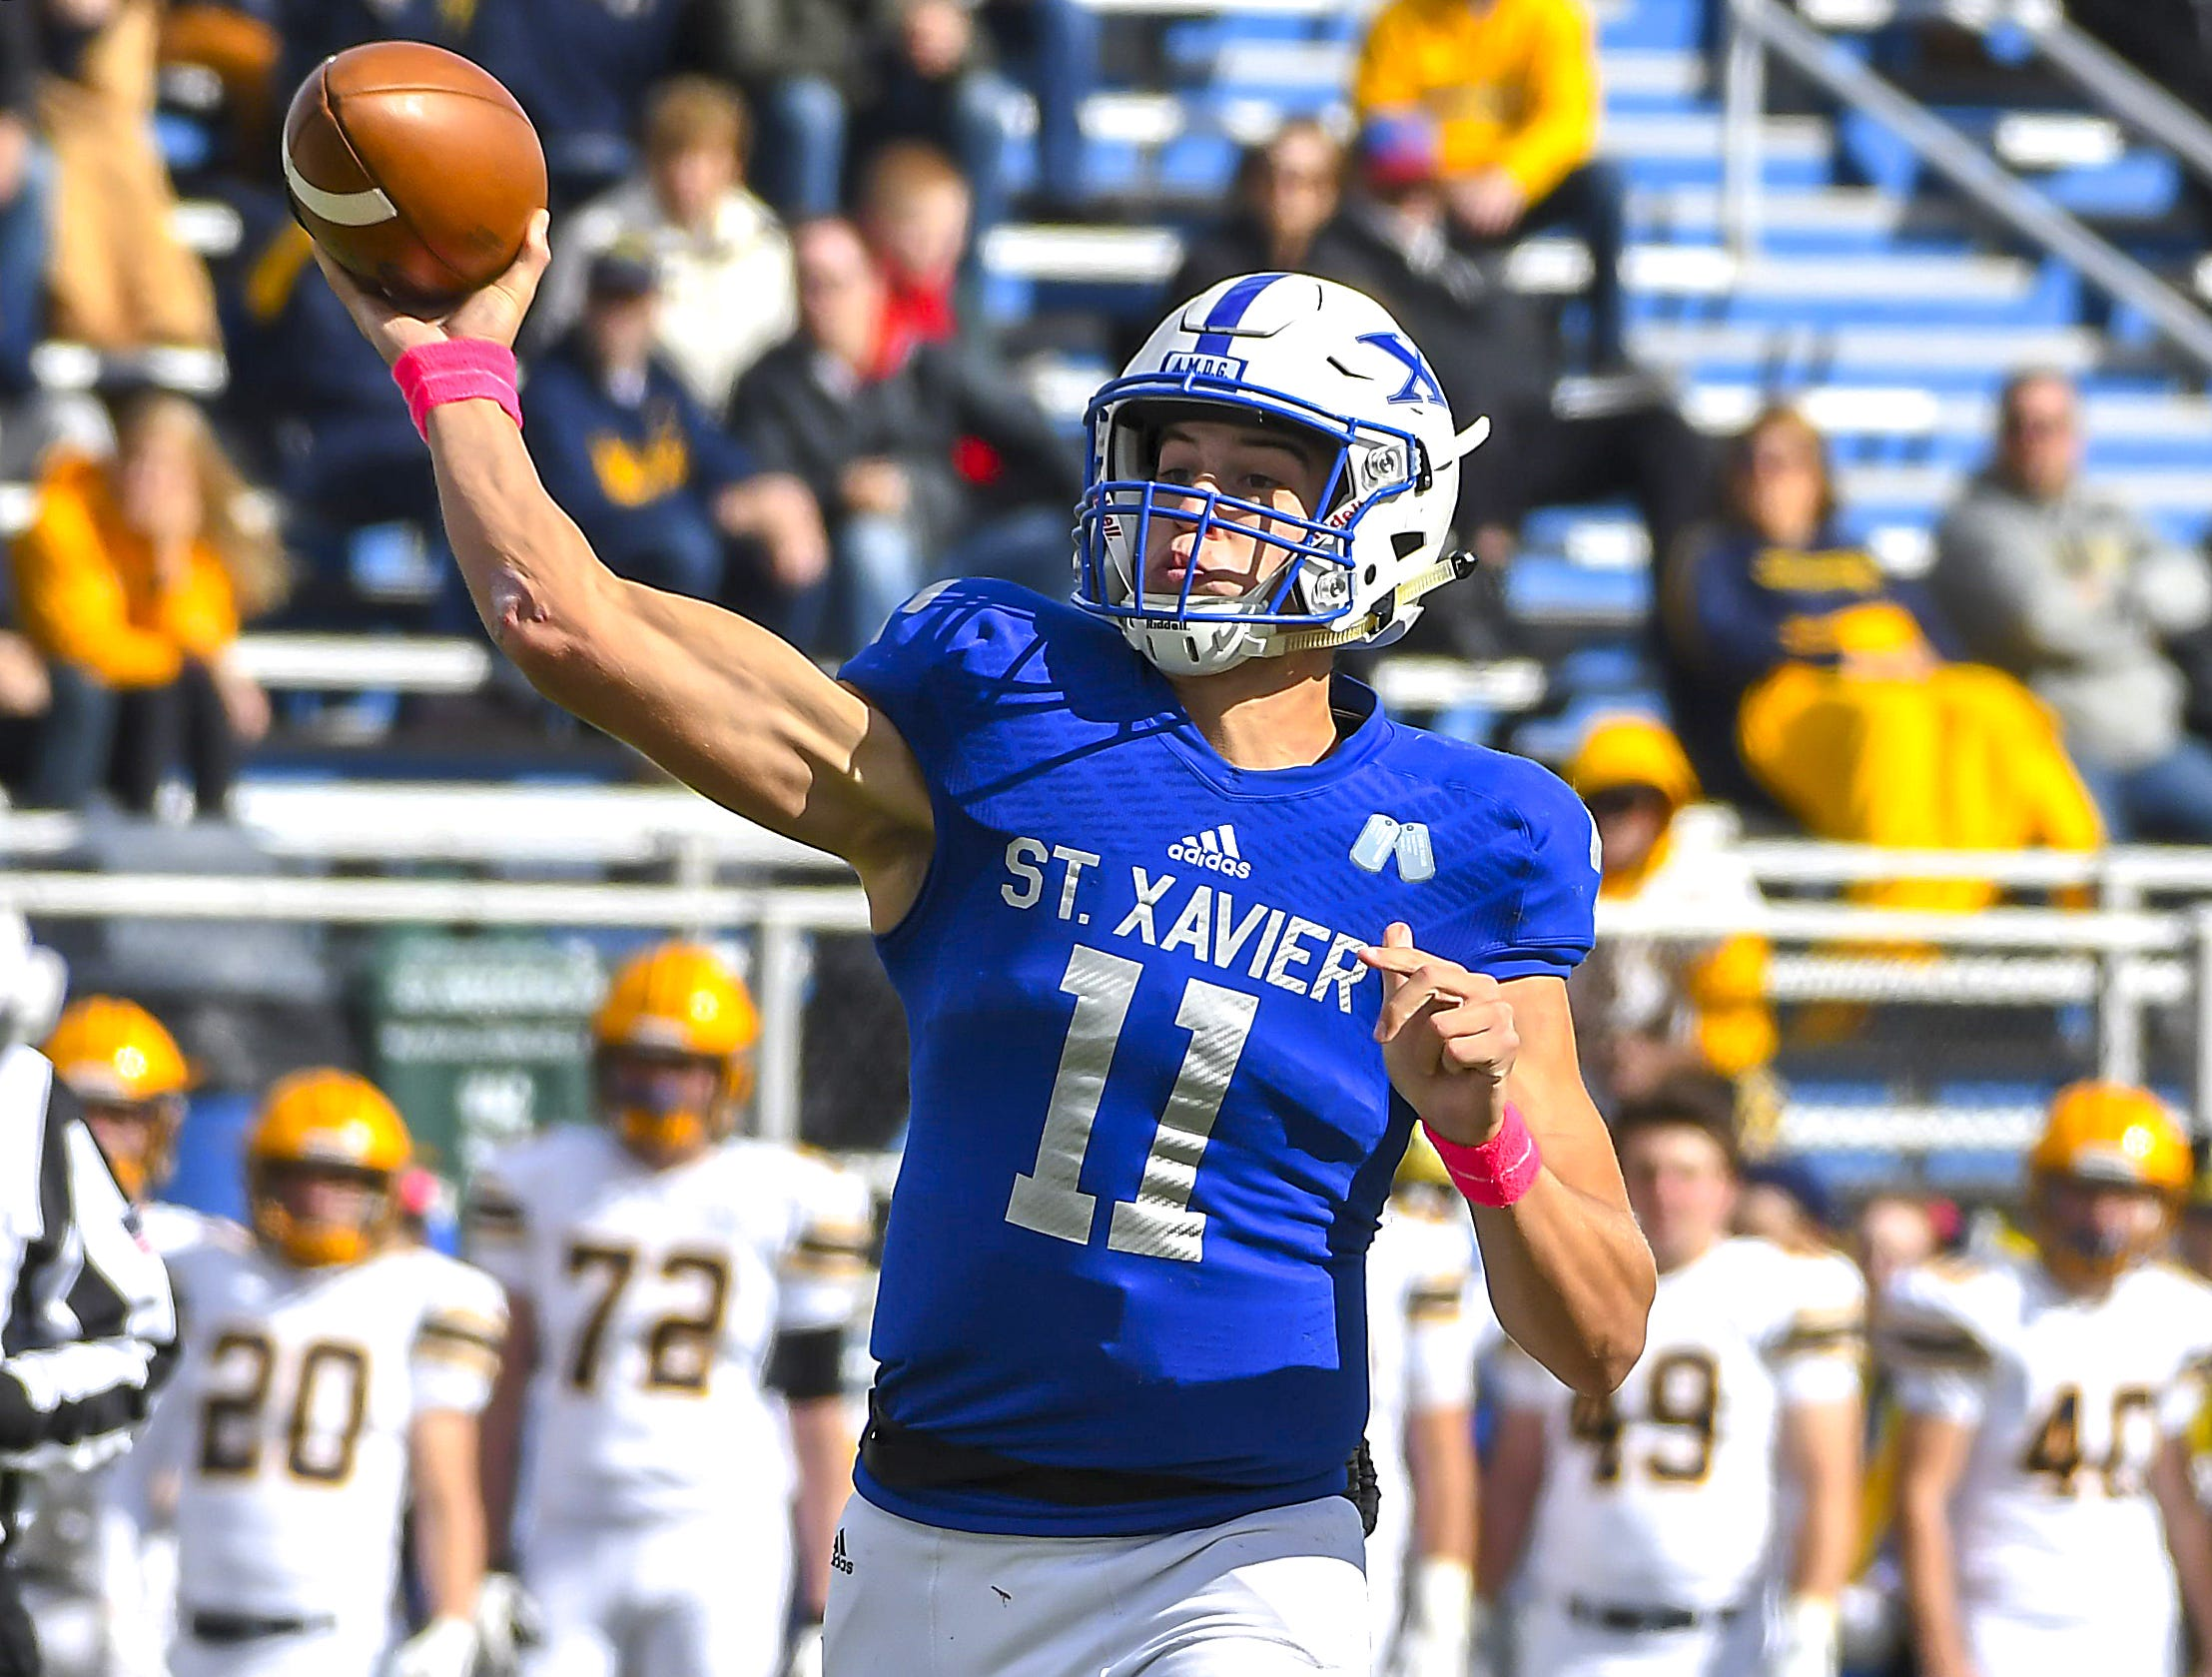 St. X quarterback Wyatt Hudepohl throws a touchdown pass against Cleveland St. Ignatius at St. Xavier High School, Saturday, October, 20 2018